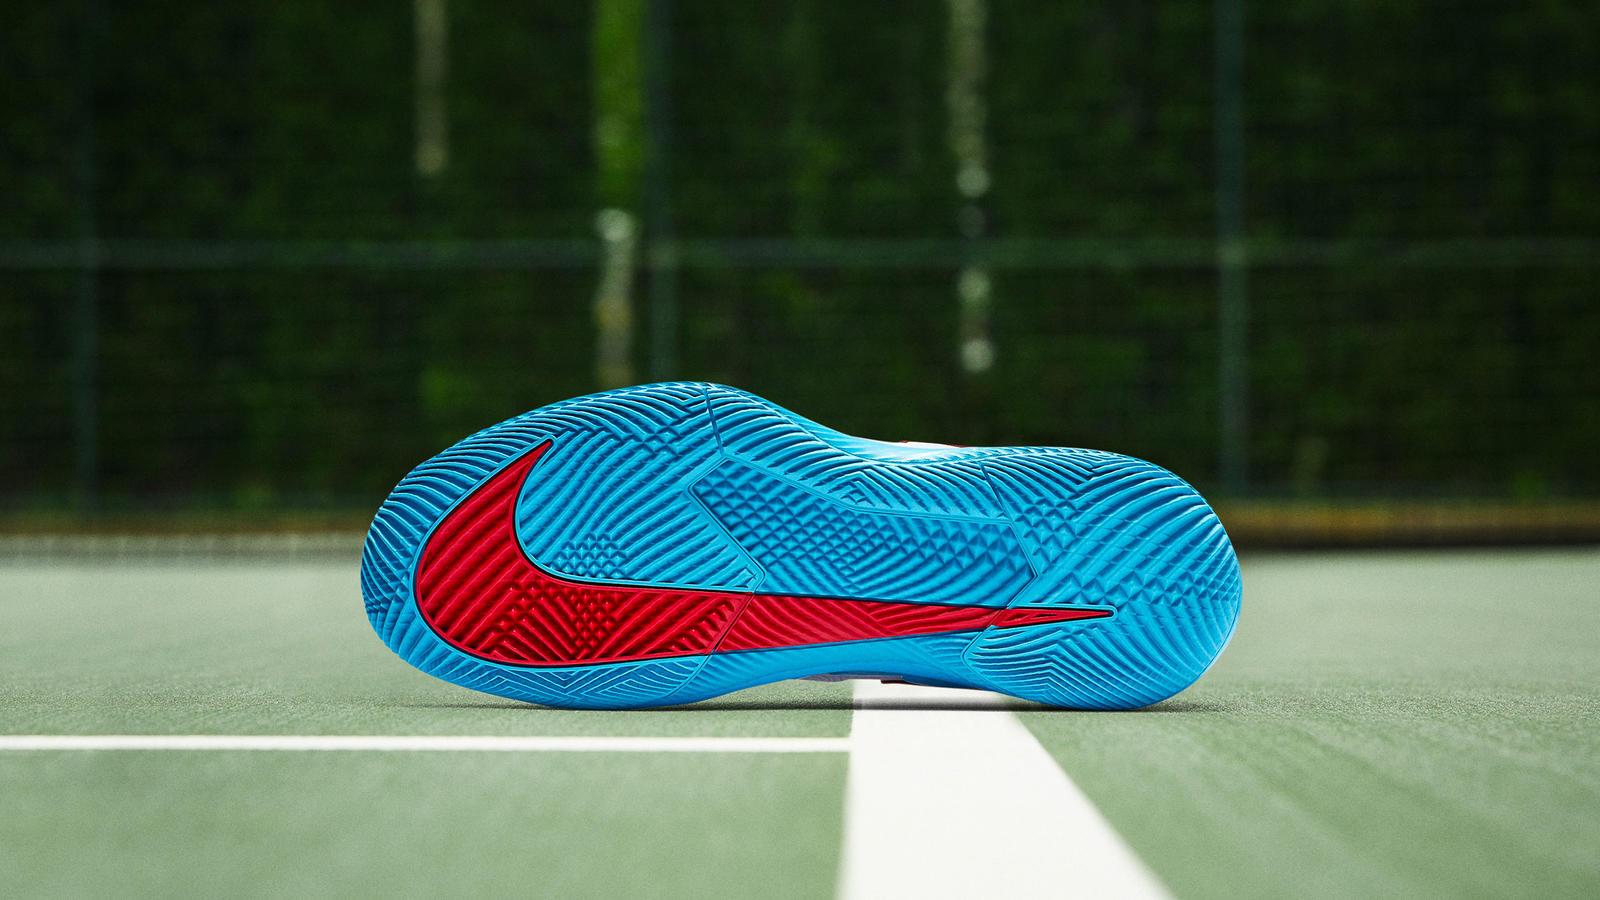 NikeCourt Air Zoom Vapor X LTR PE